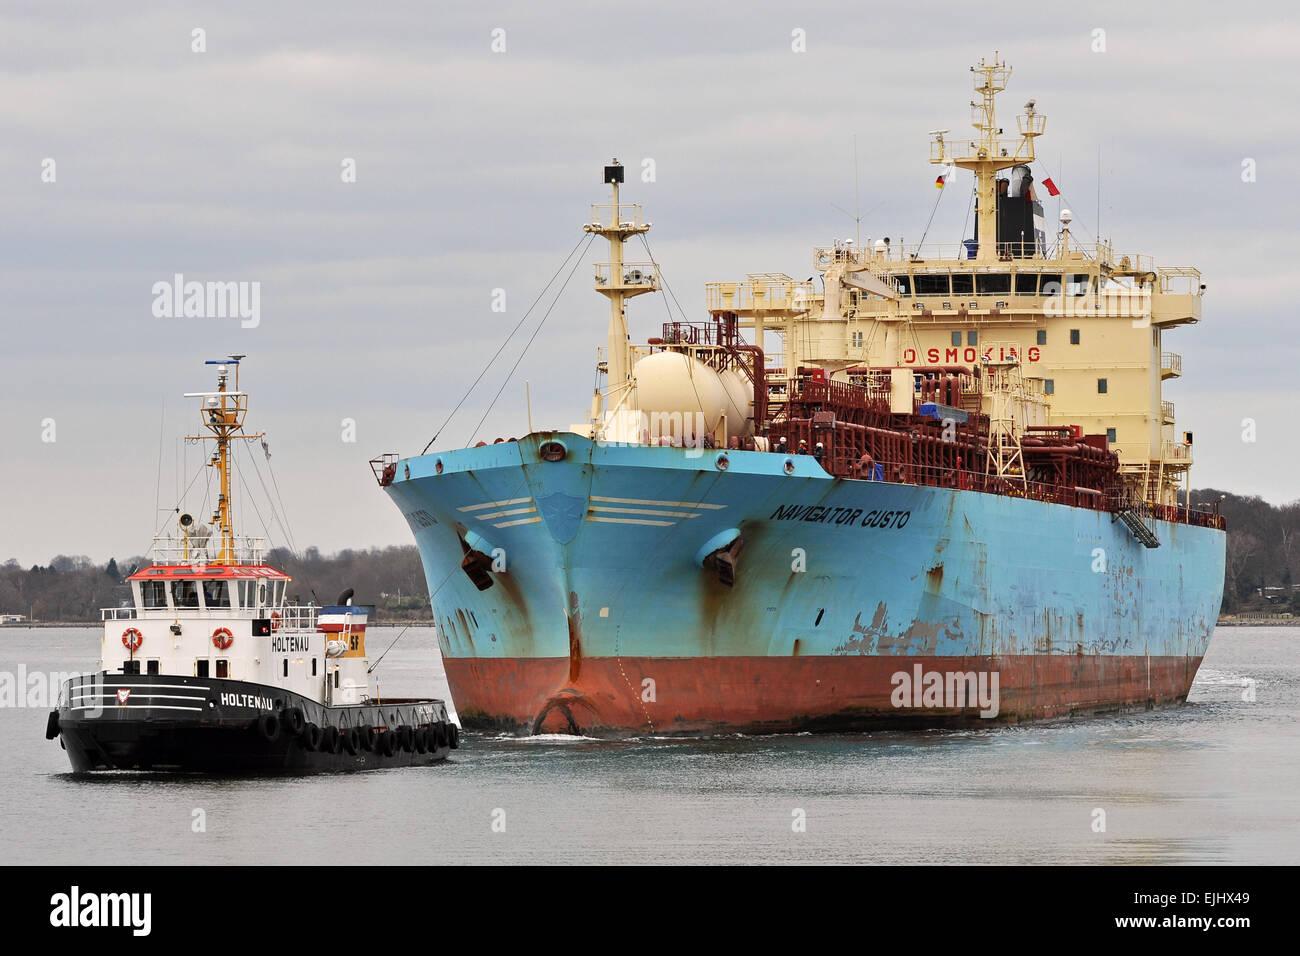 LPG Tanker Navigator Gusto with Tugboat Holtenau - Stock Image